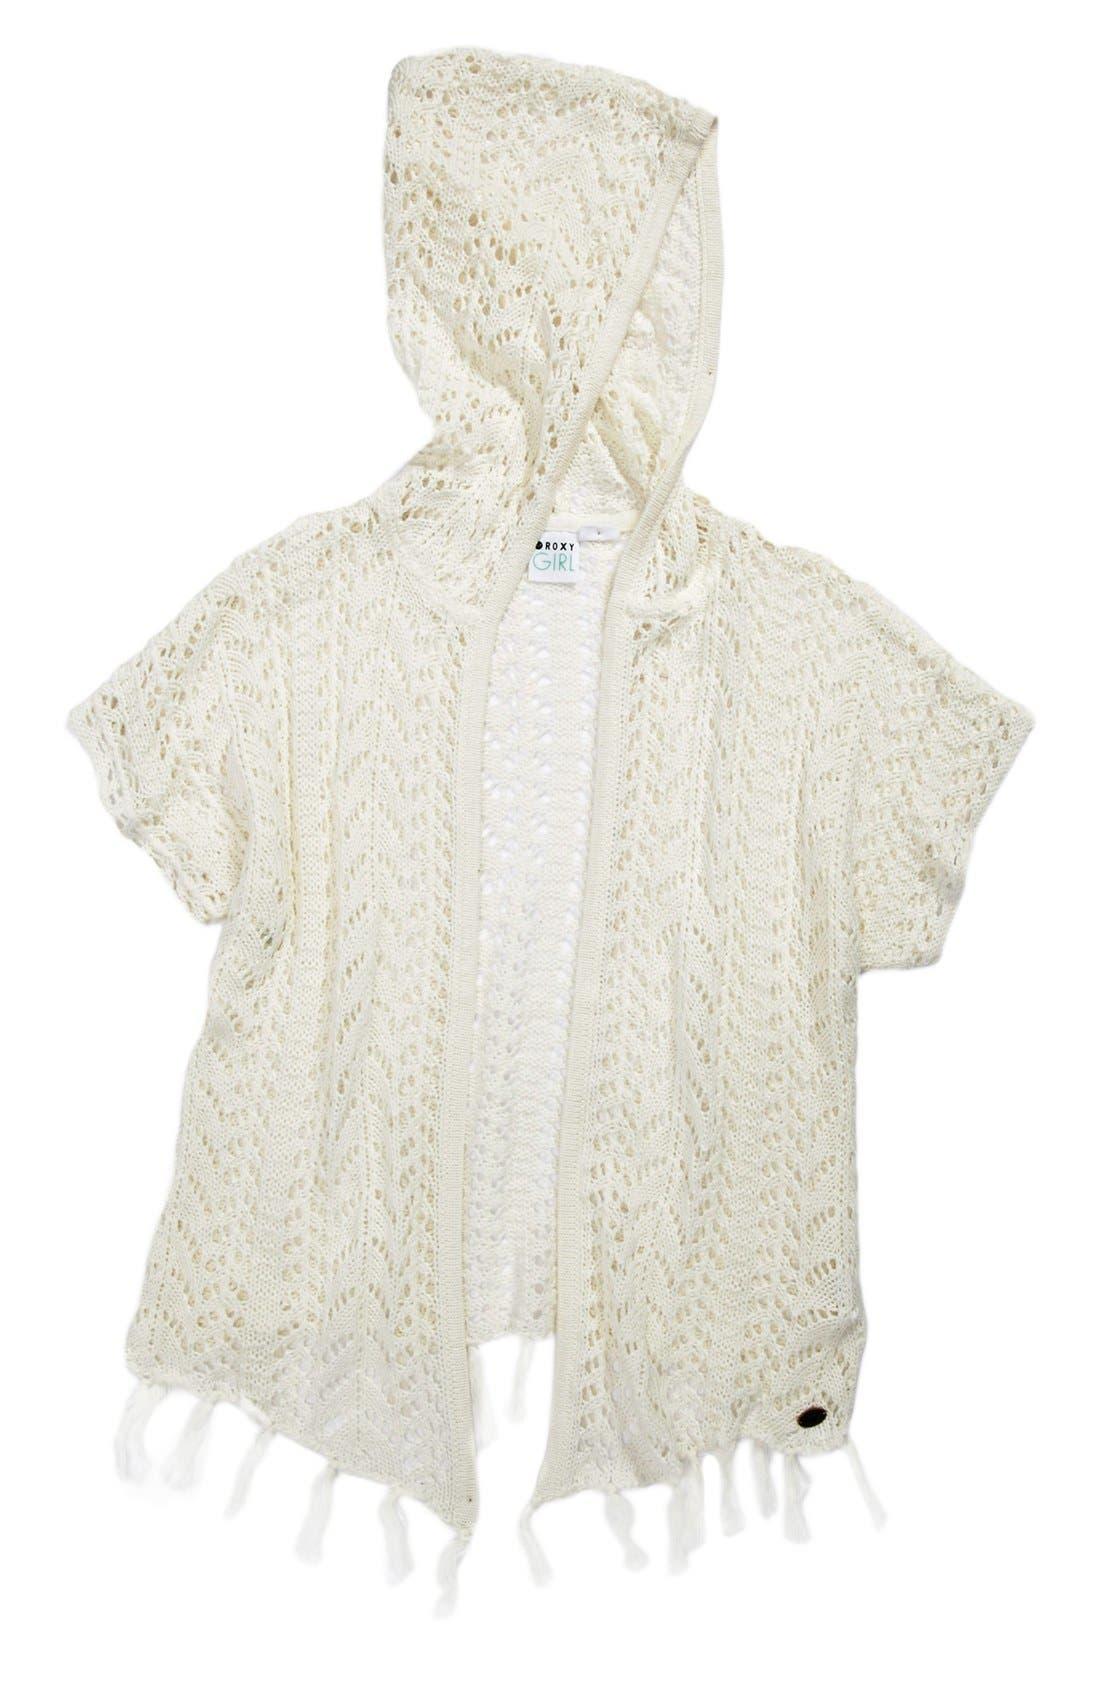 Alternate Image 1 Selected - 'Dancing Waves' Crochet Hooded Sweater (Big Girls)